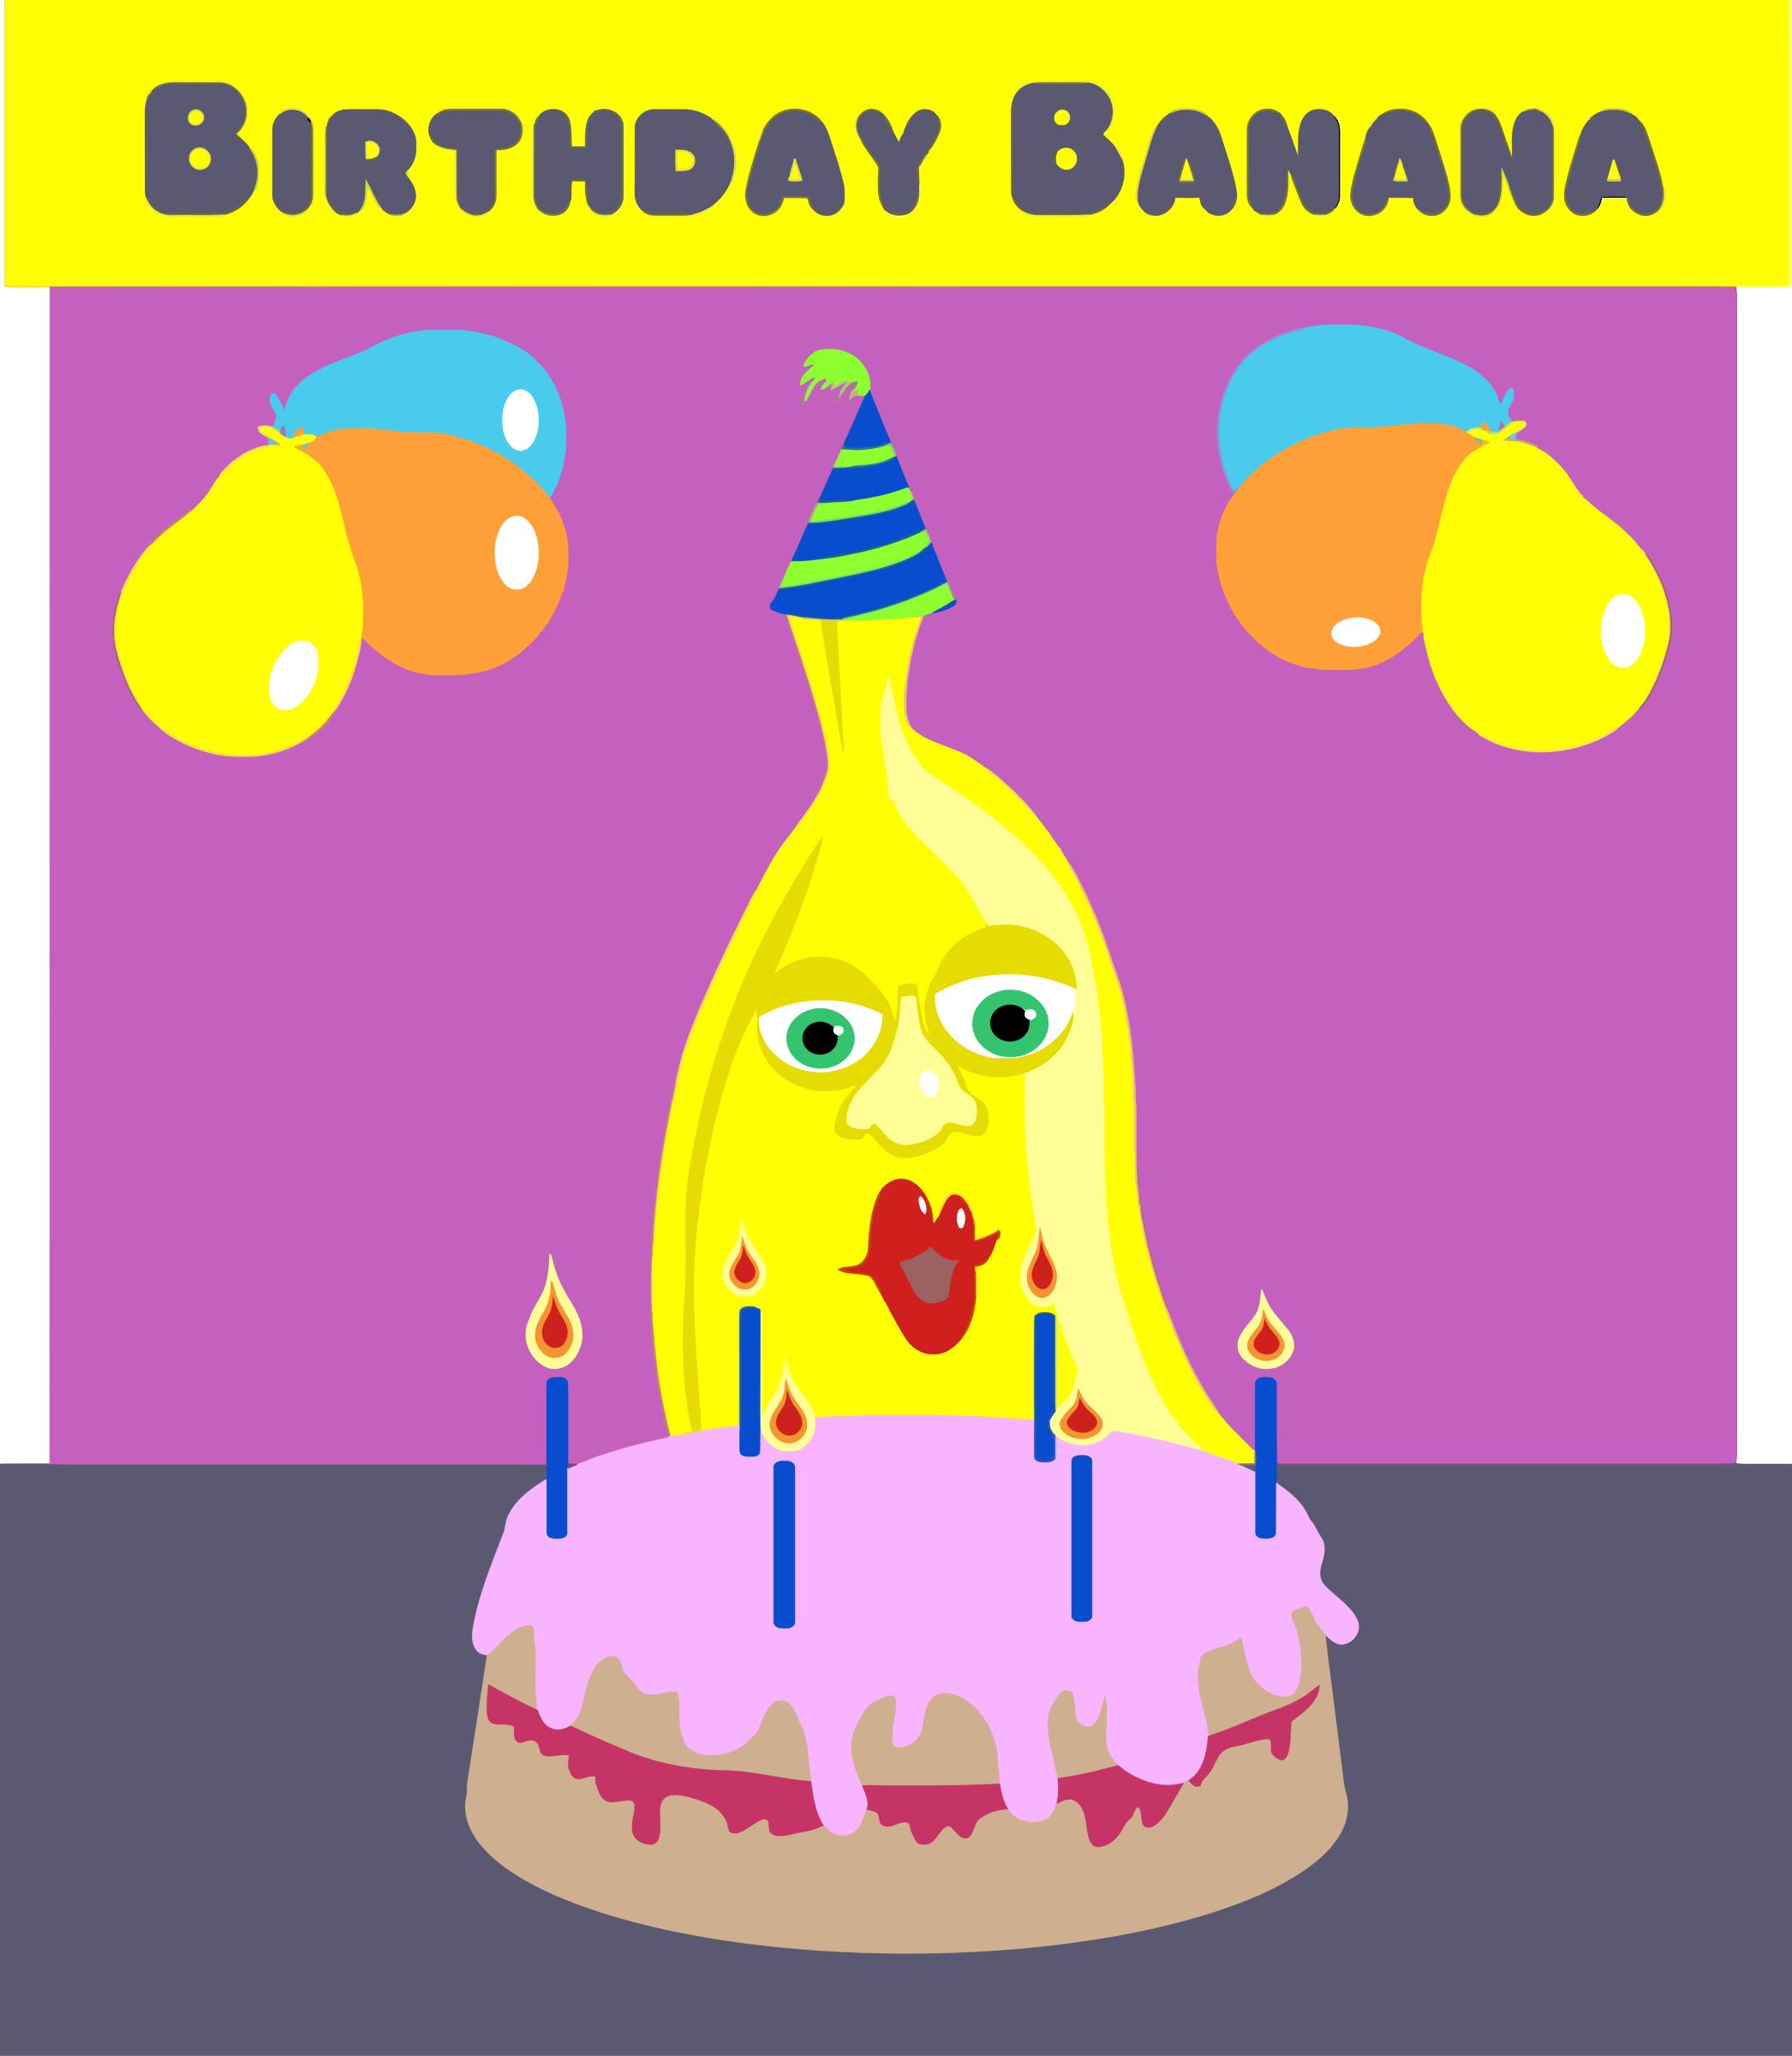 Clipart - Birthday Ban...